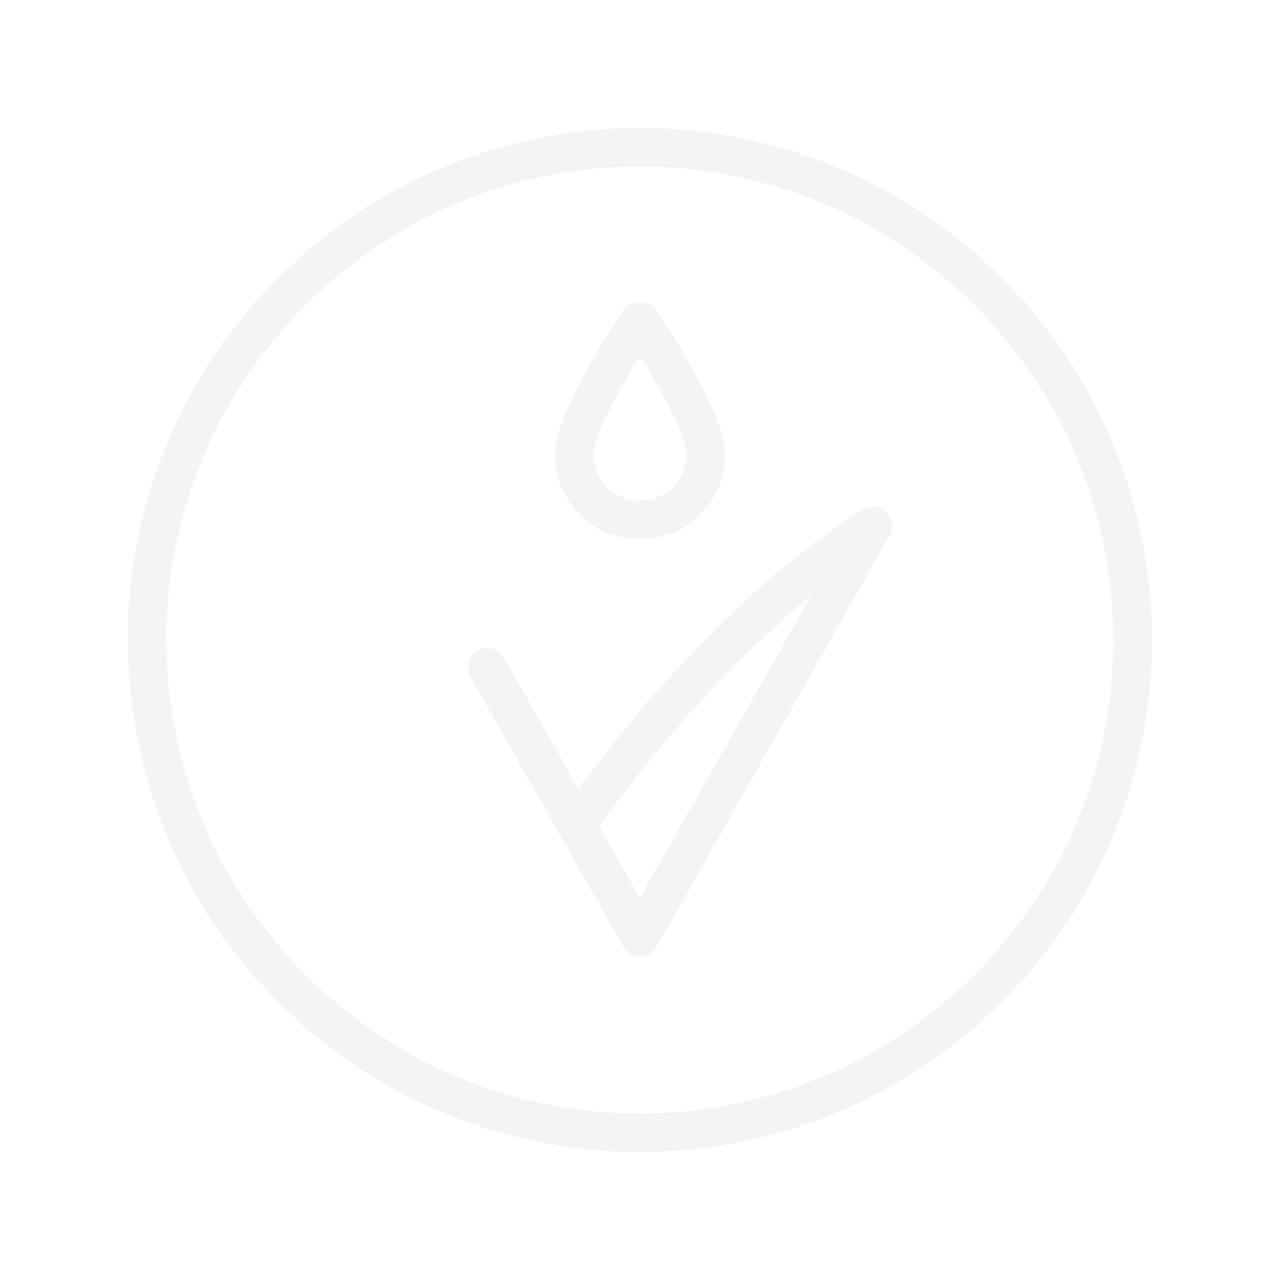 BOURJOIS LIner Feutre Slim Eyeliner No.17 Ultra Black 0.8ml